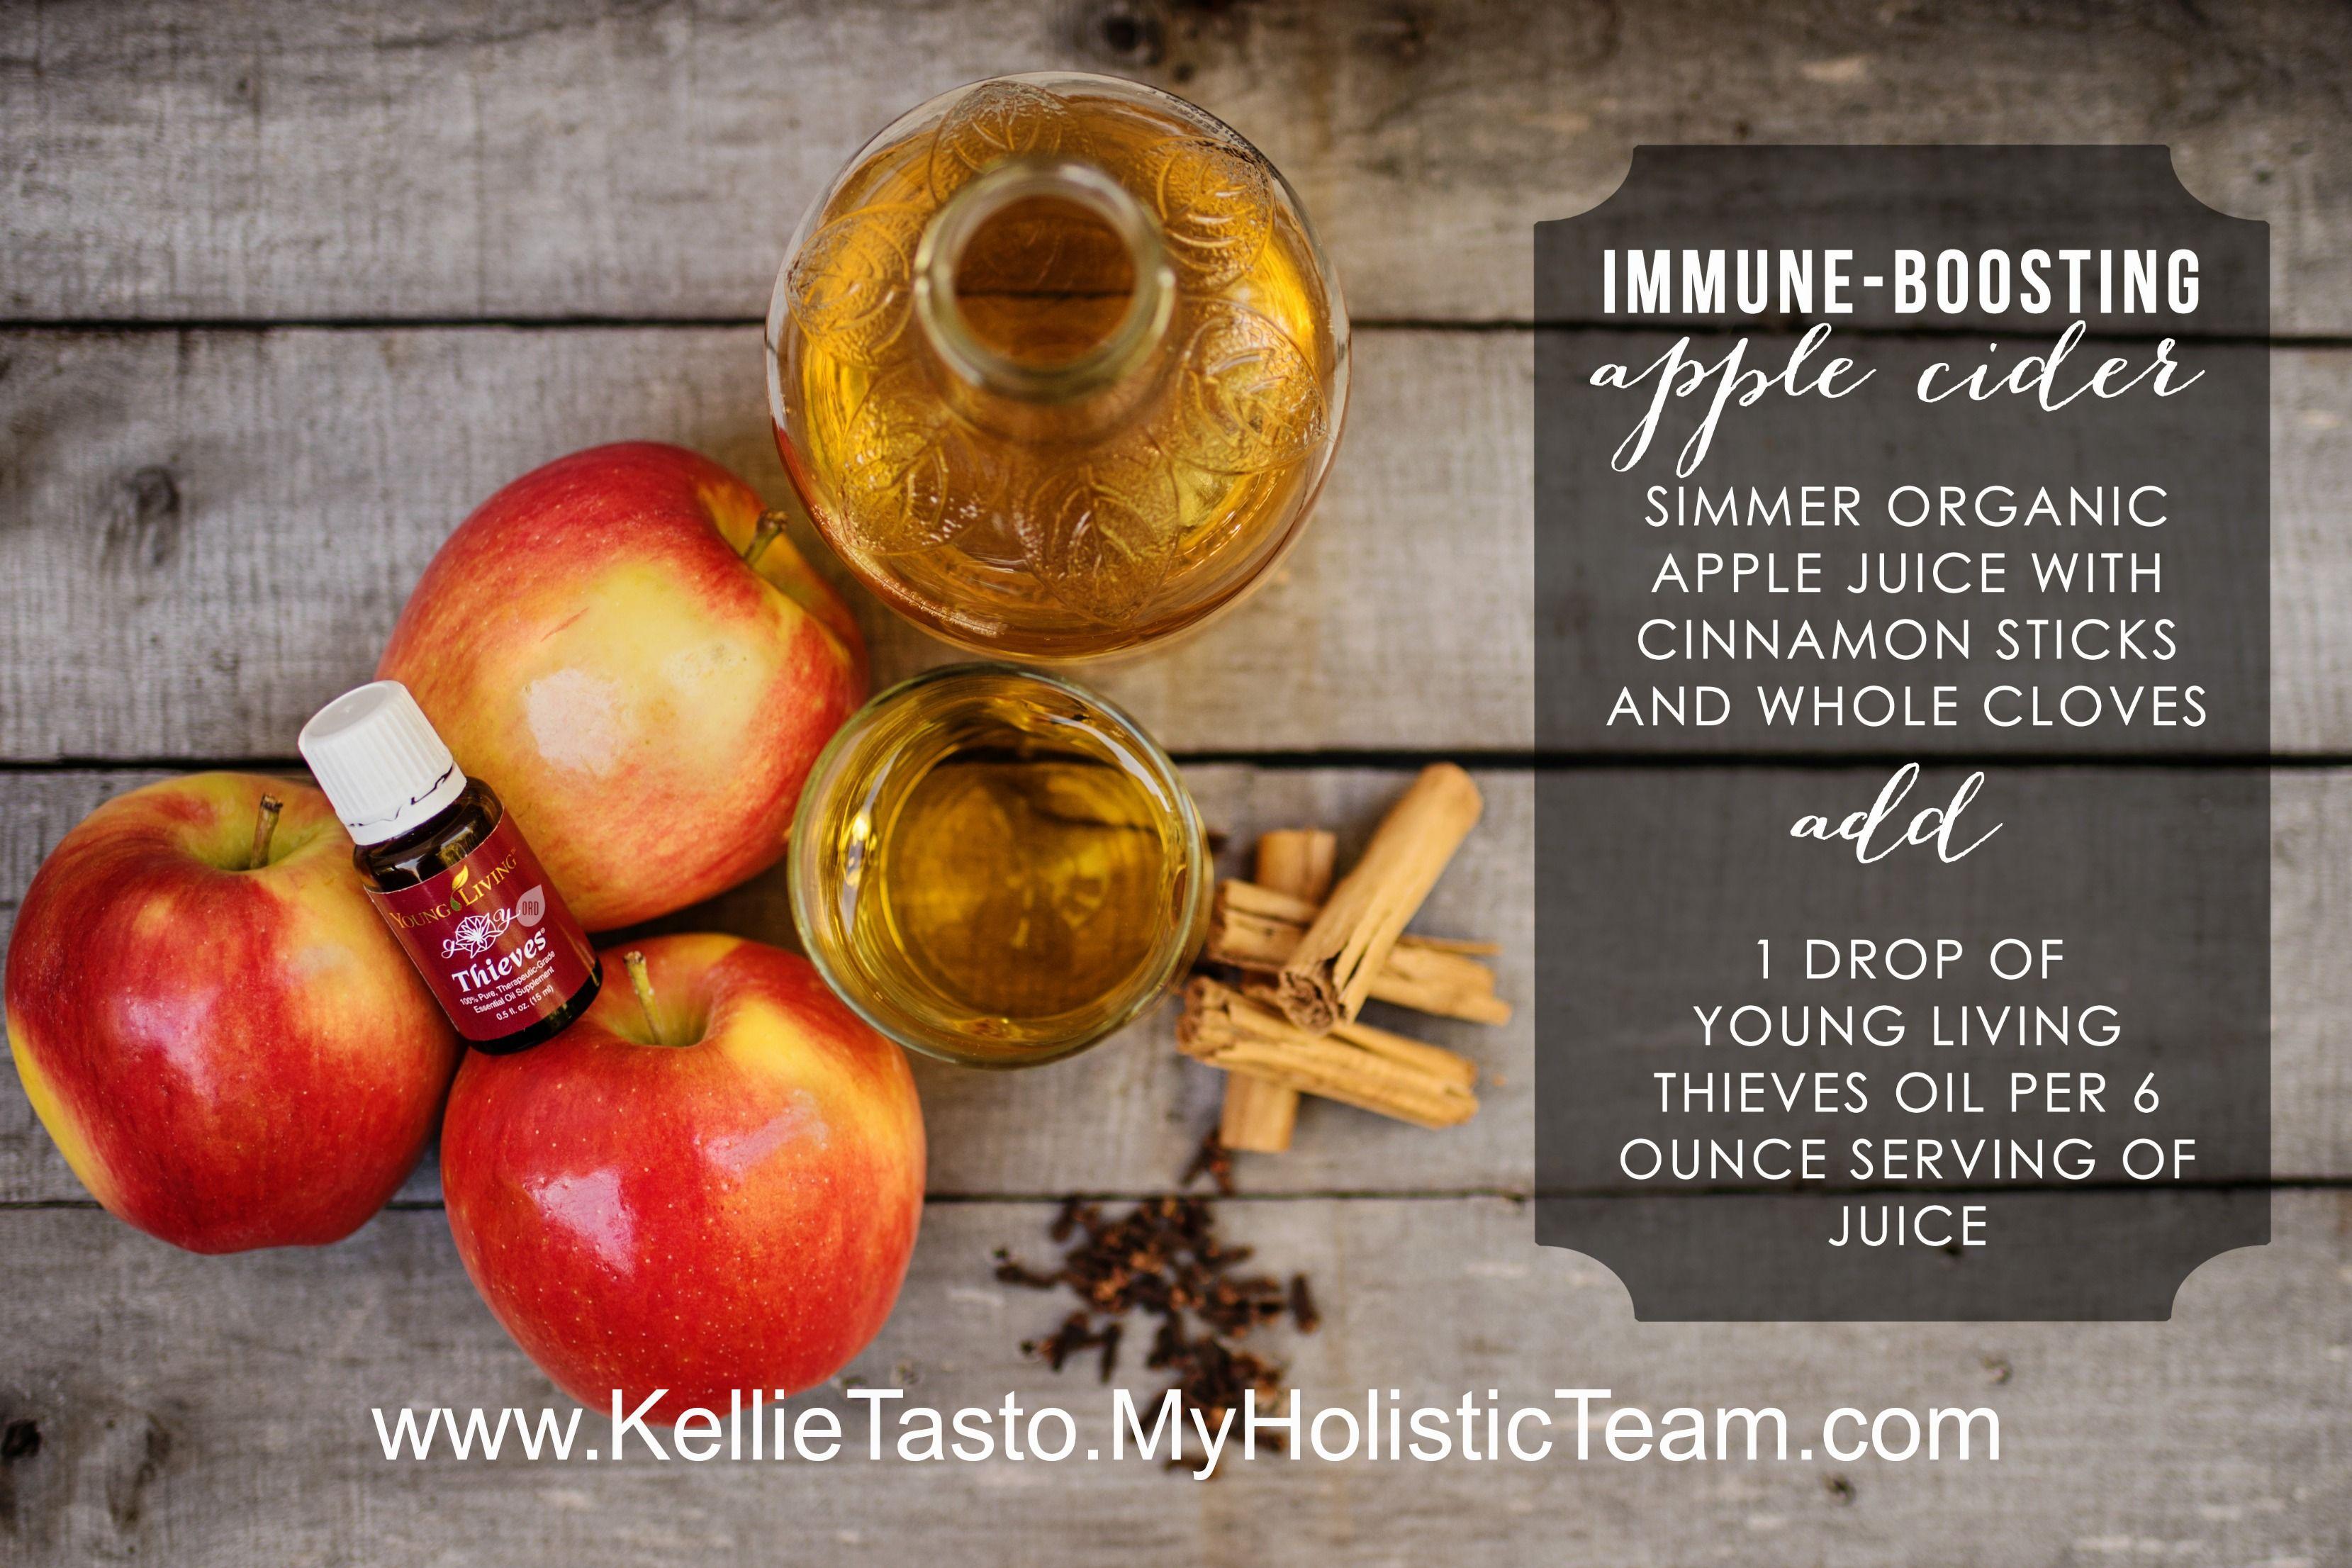 A tasty way to boost your immune system! www.KellieTasto.MyHolisticTeam.com